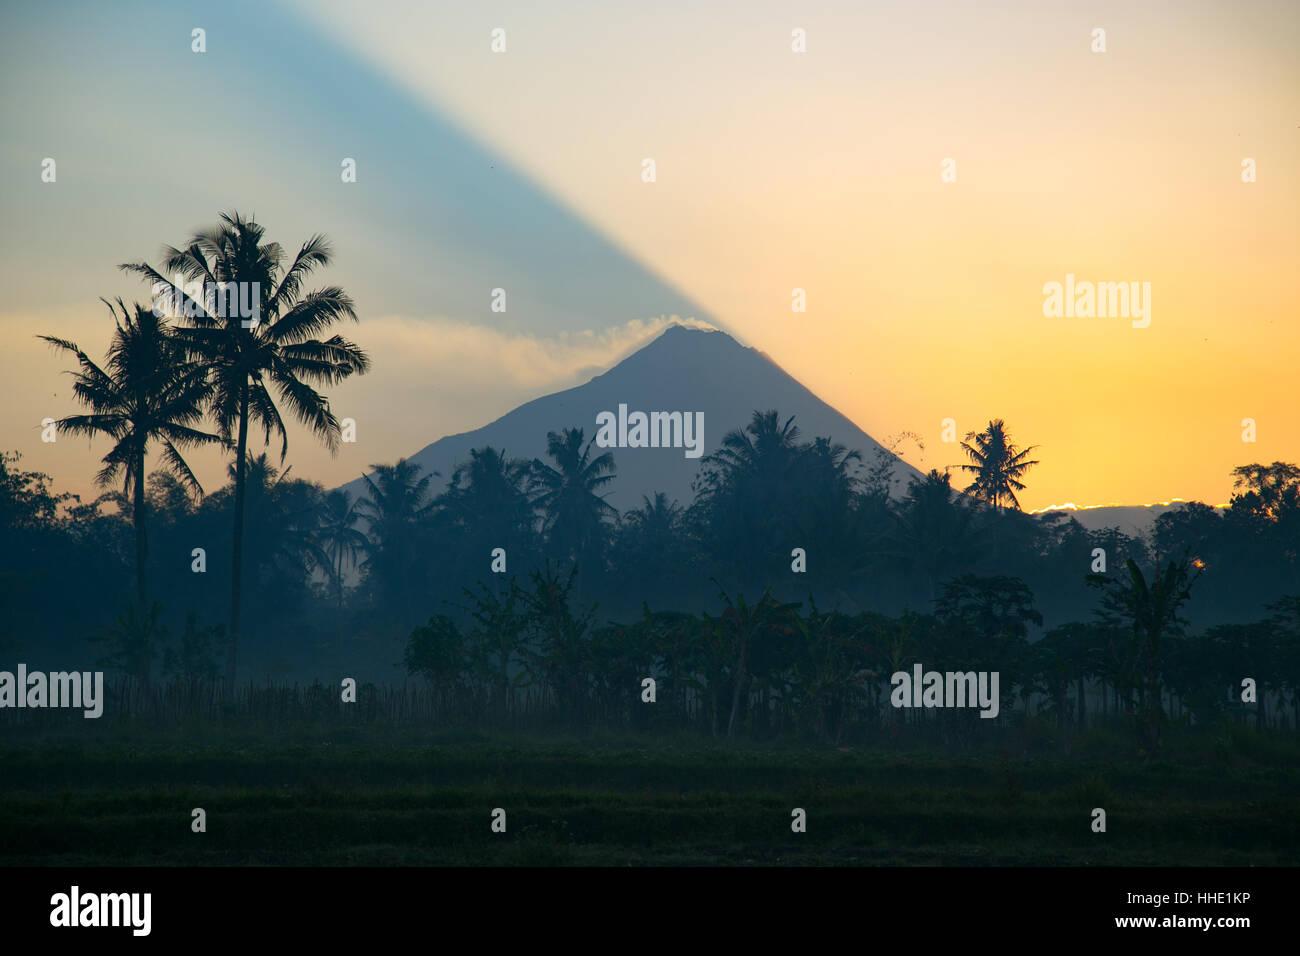 Sun Rising Over Mount Merapi Volcano Central Java Indonesia - Stock Image